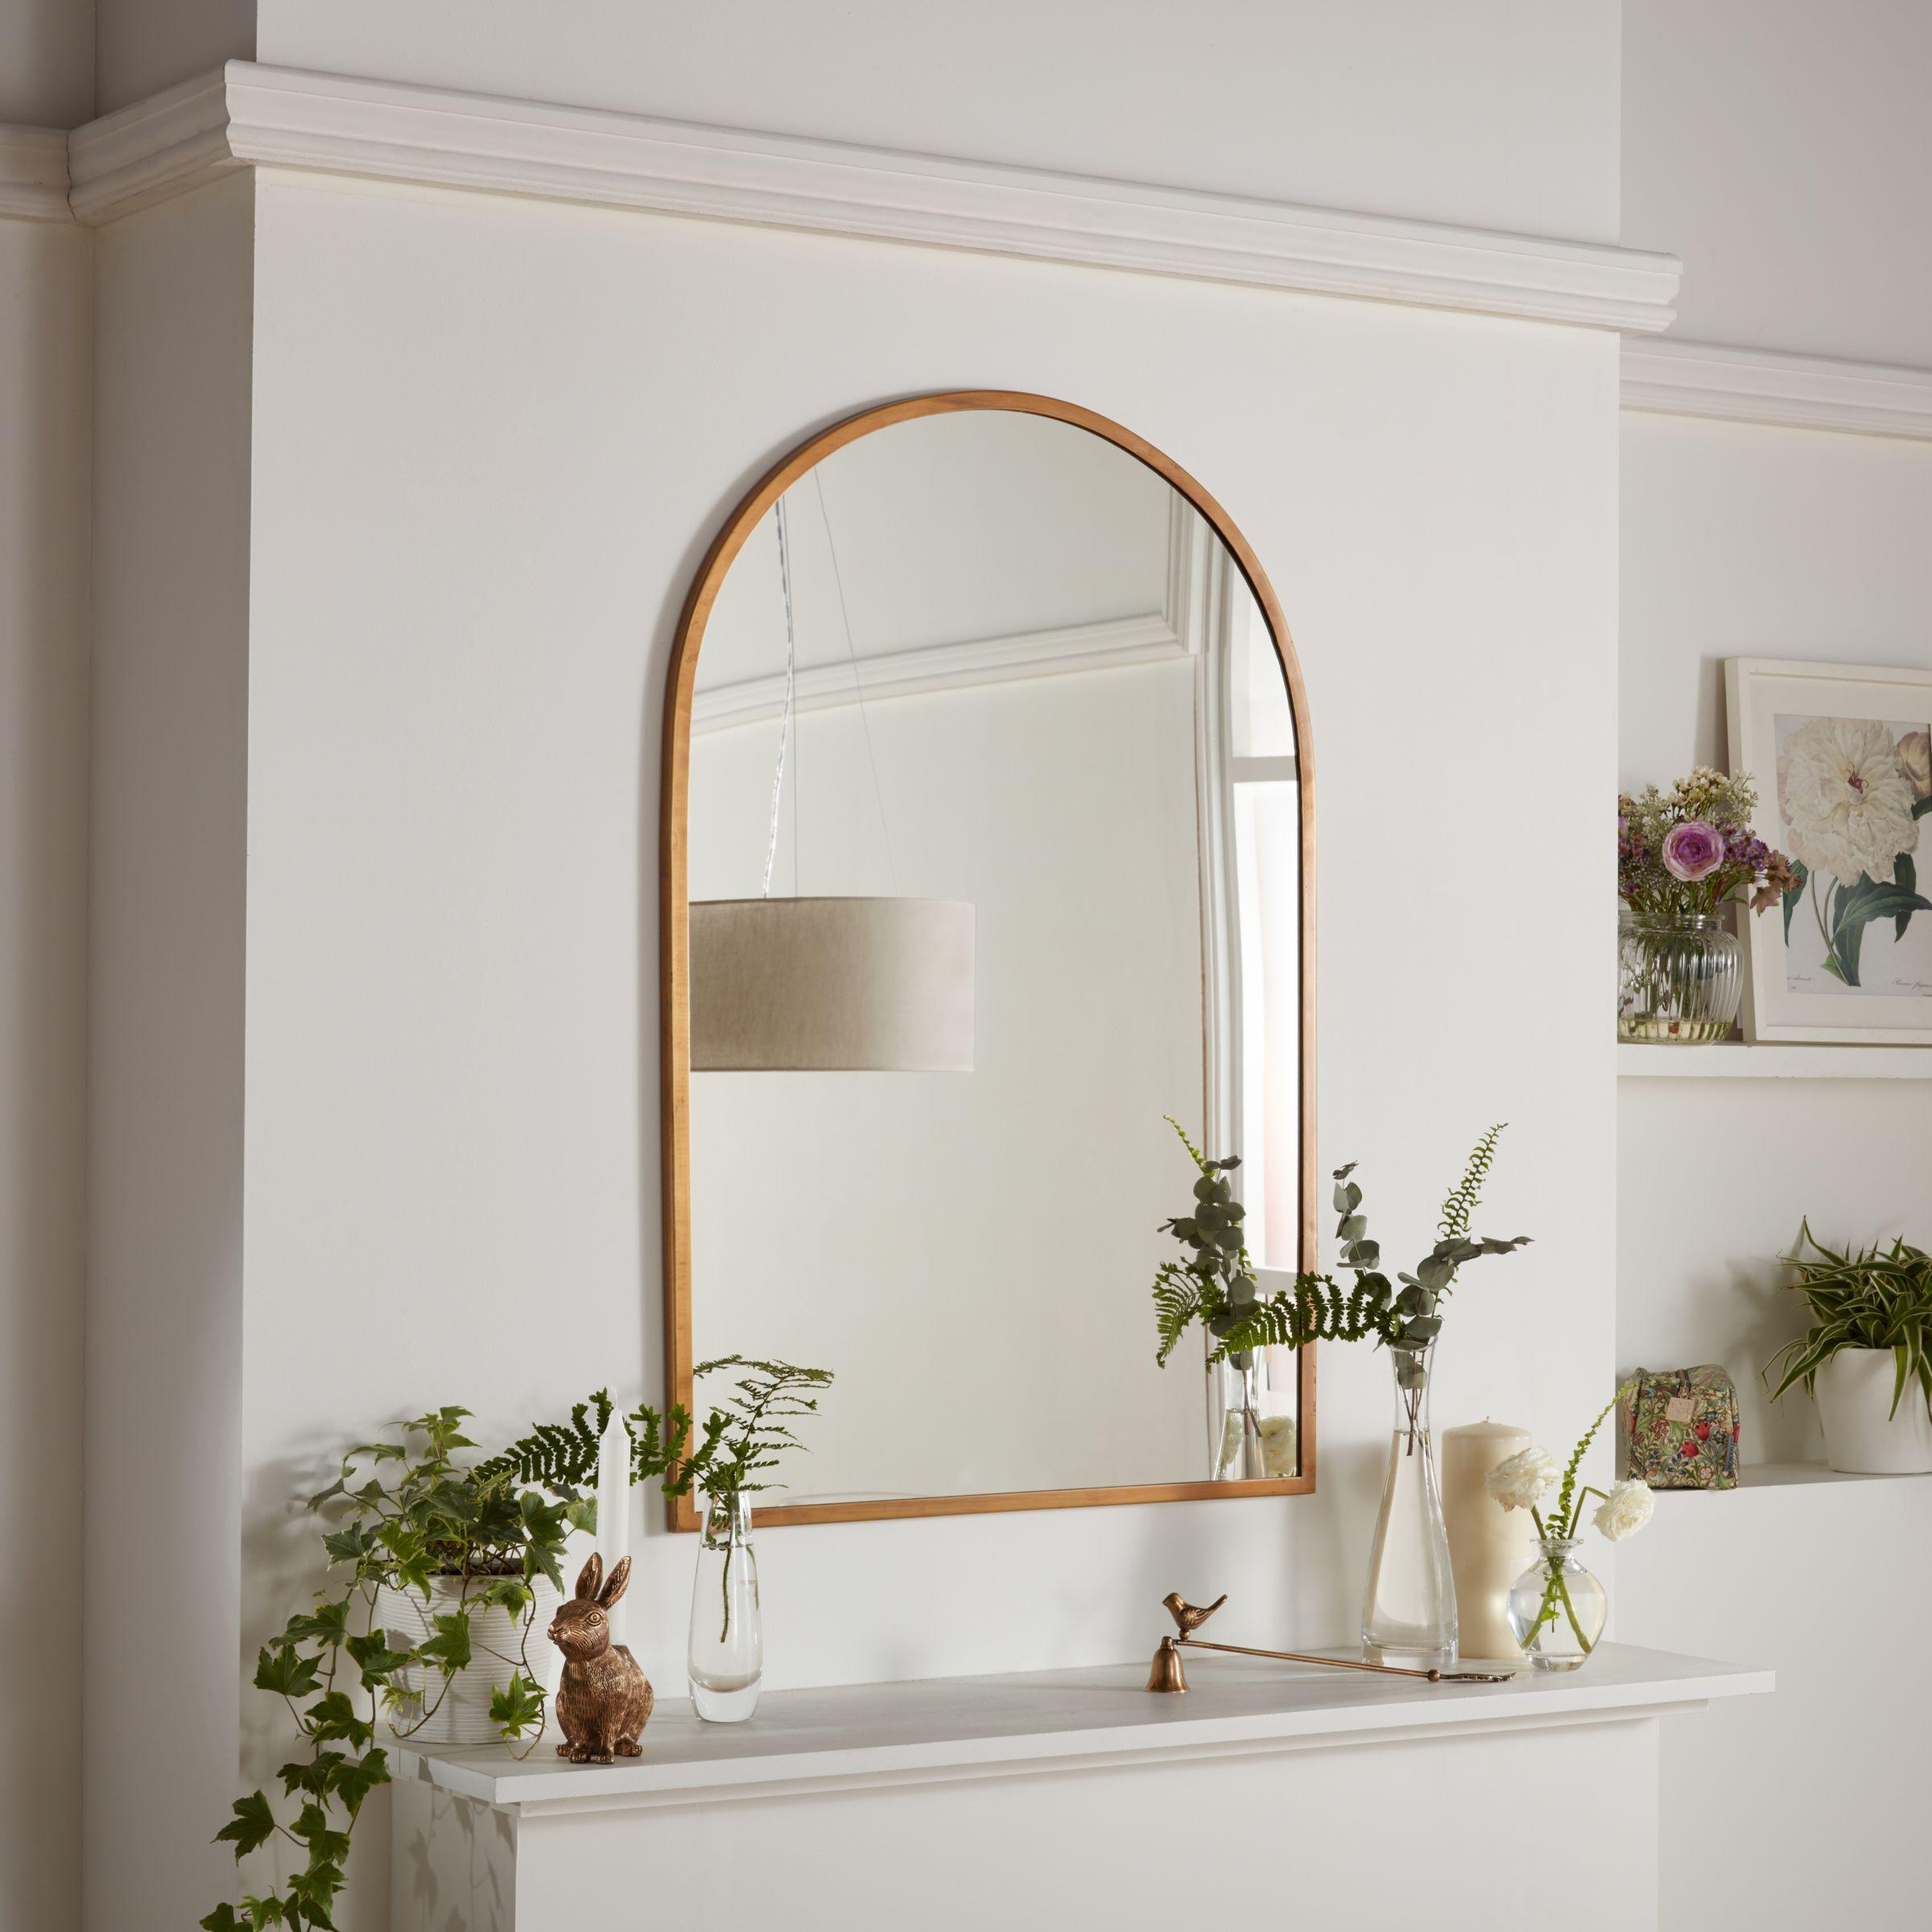 John Lewis Arch Mirror Antique Brass At John Lewis Partners